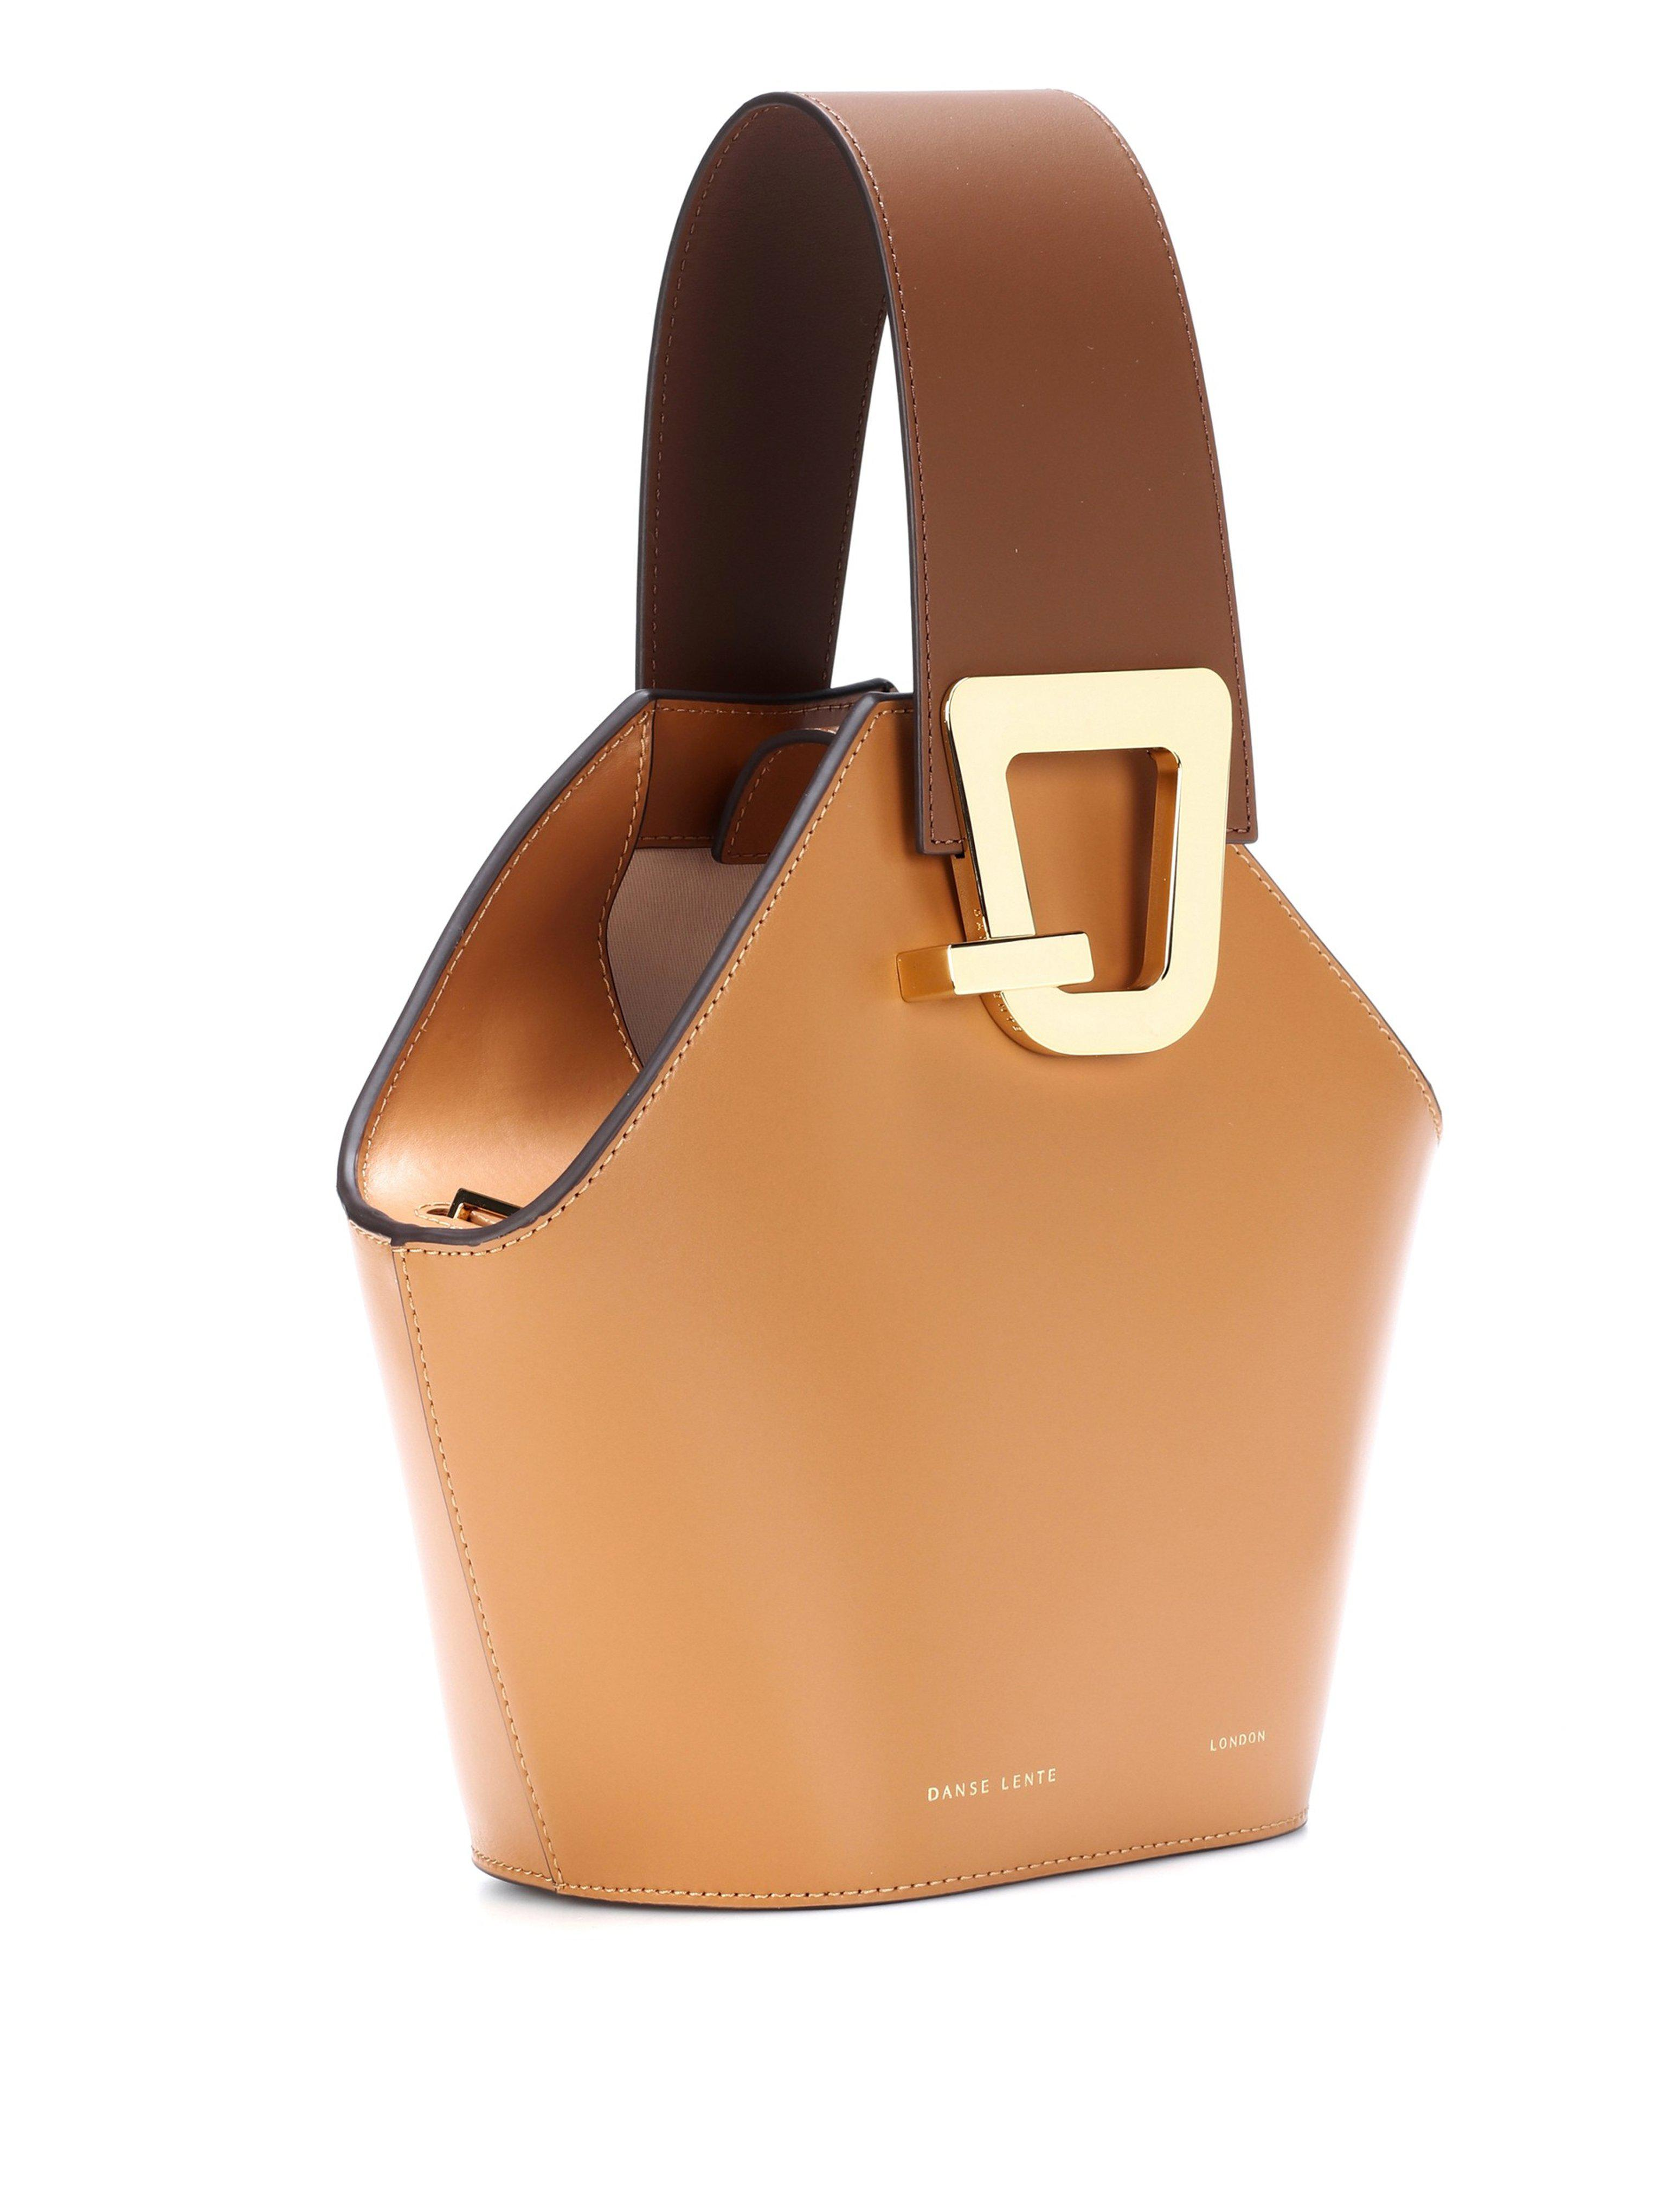 31969013d195 Lyst - Danse Lente Mini Johnny Bucket Bag In Light Brown Leather in Brown